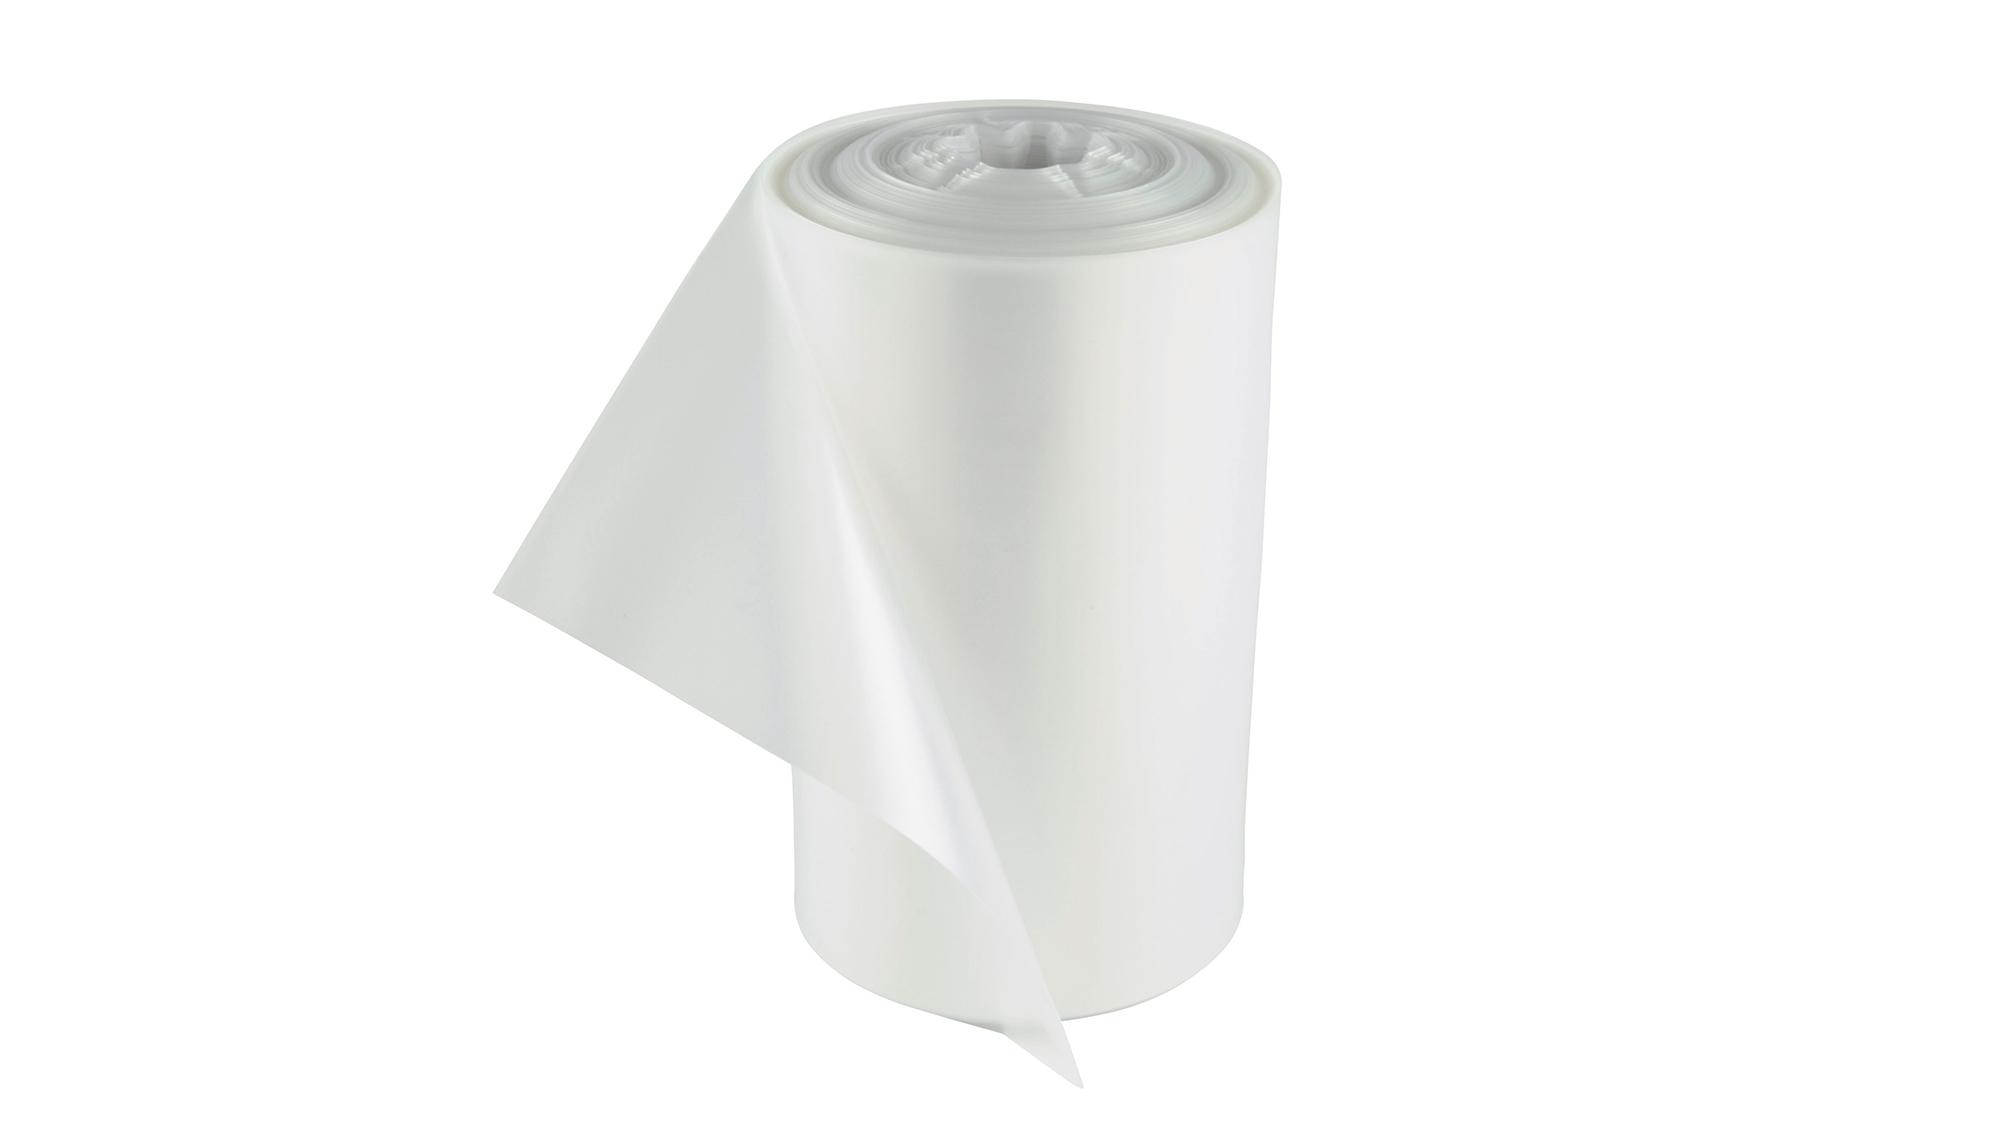 1300006 Construction dryer tube